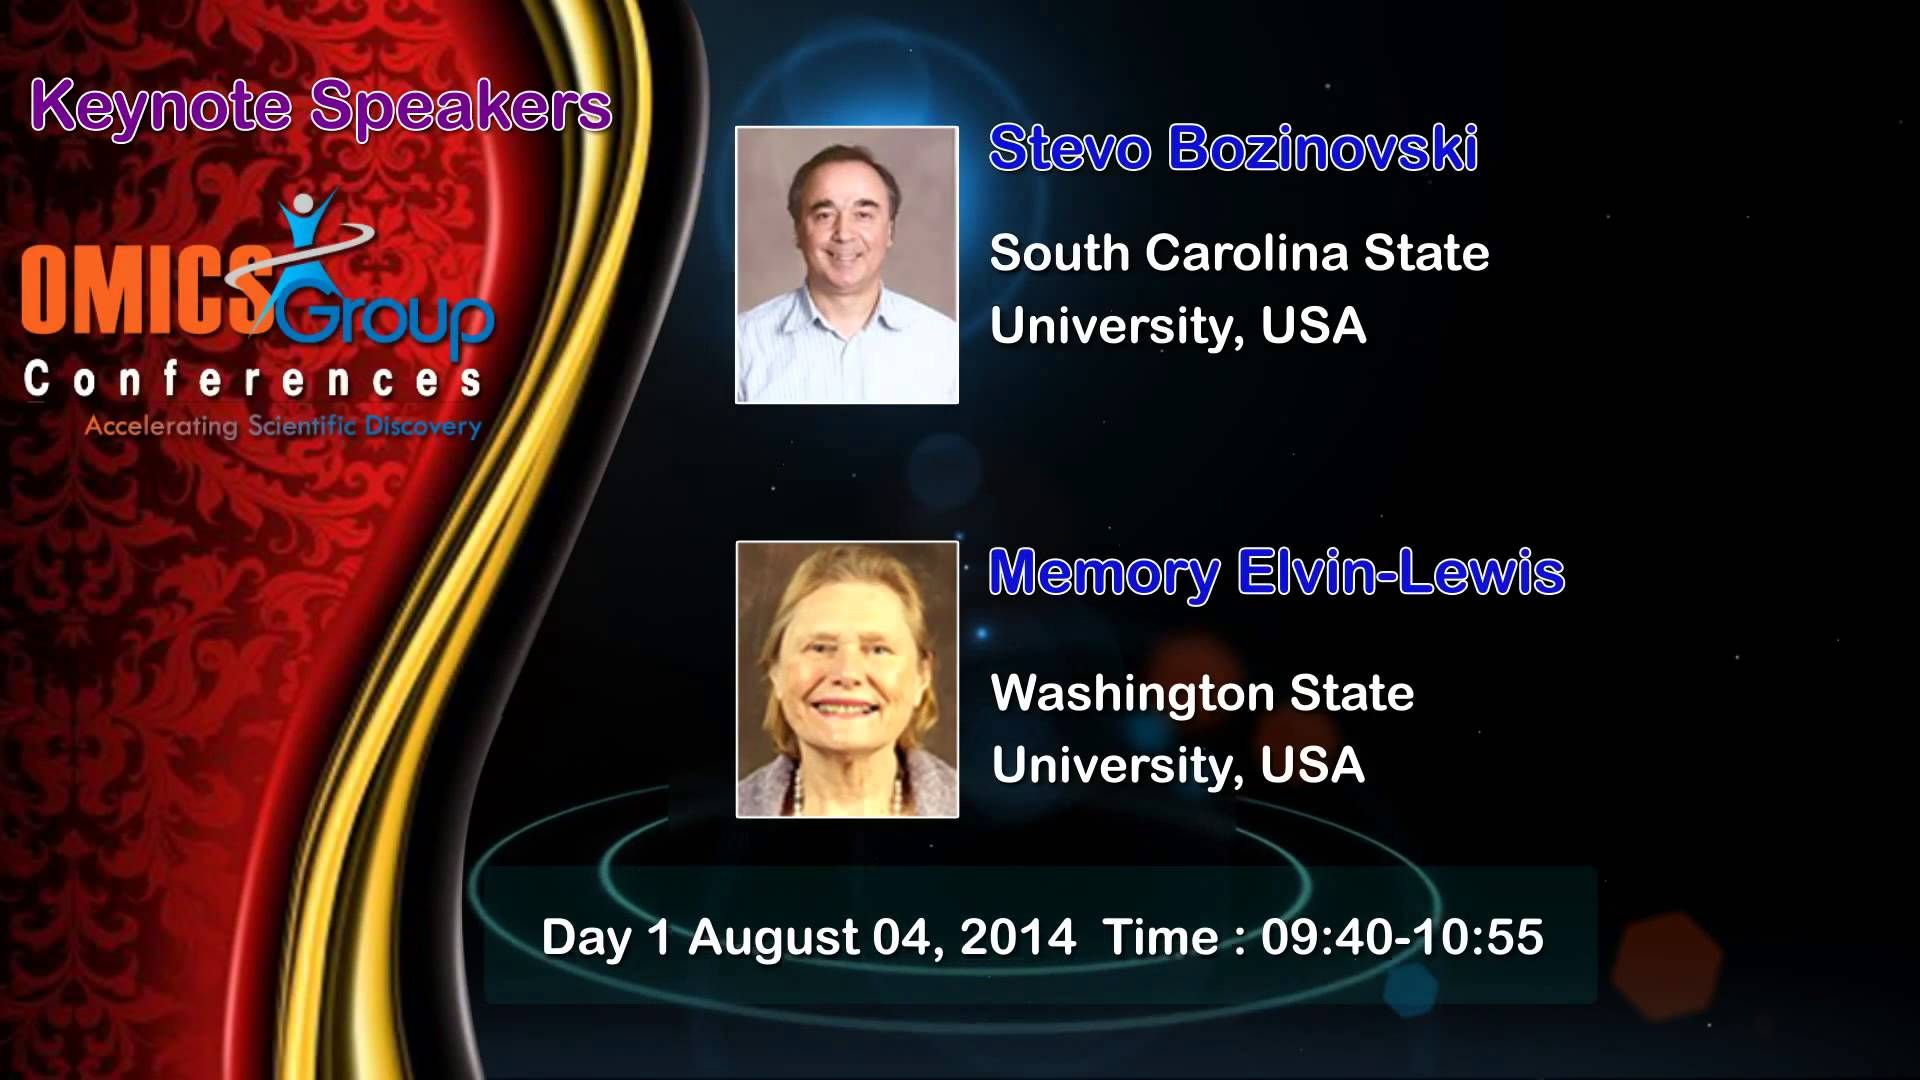 2nd International Summit on #Integrative Biology August 04-05, 2014 Chicago, USA